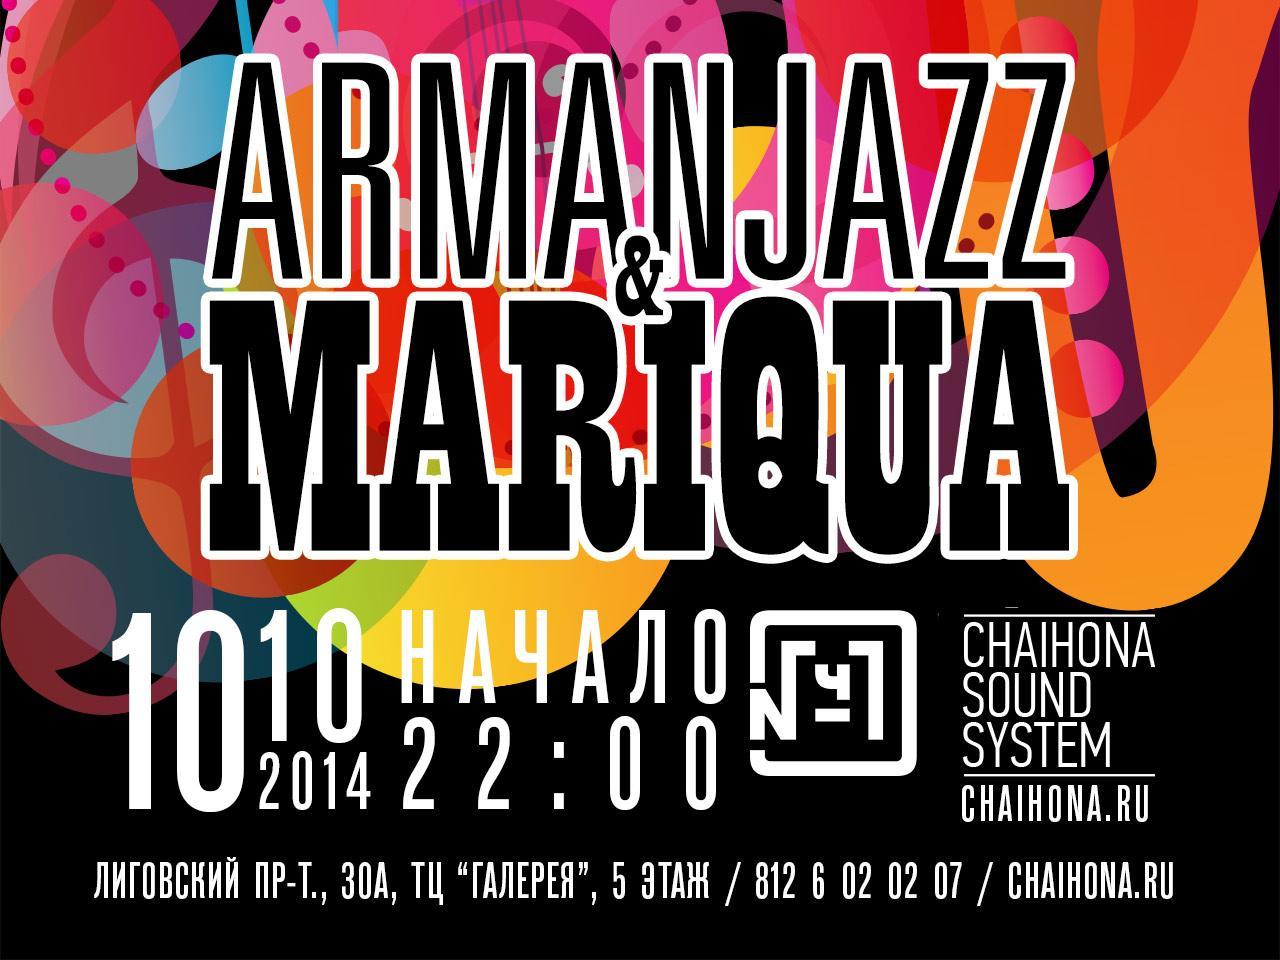 ArmanJazz&Mariqua